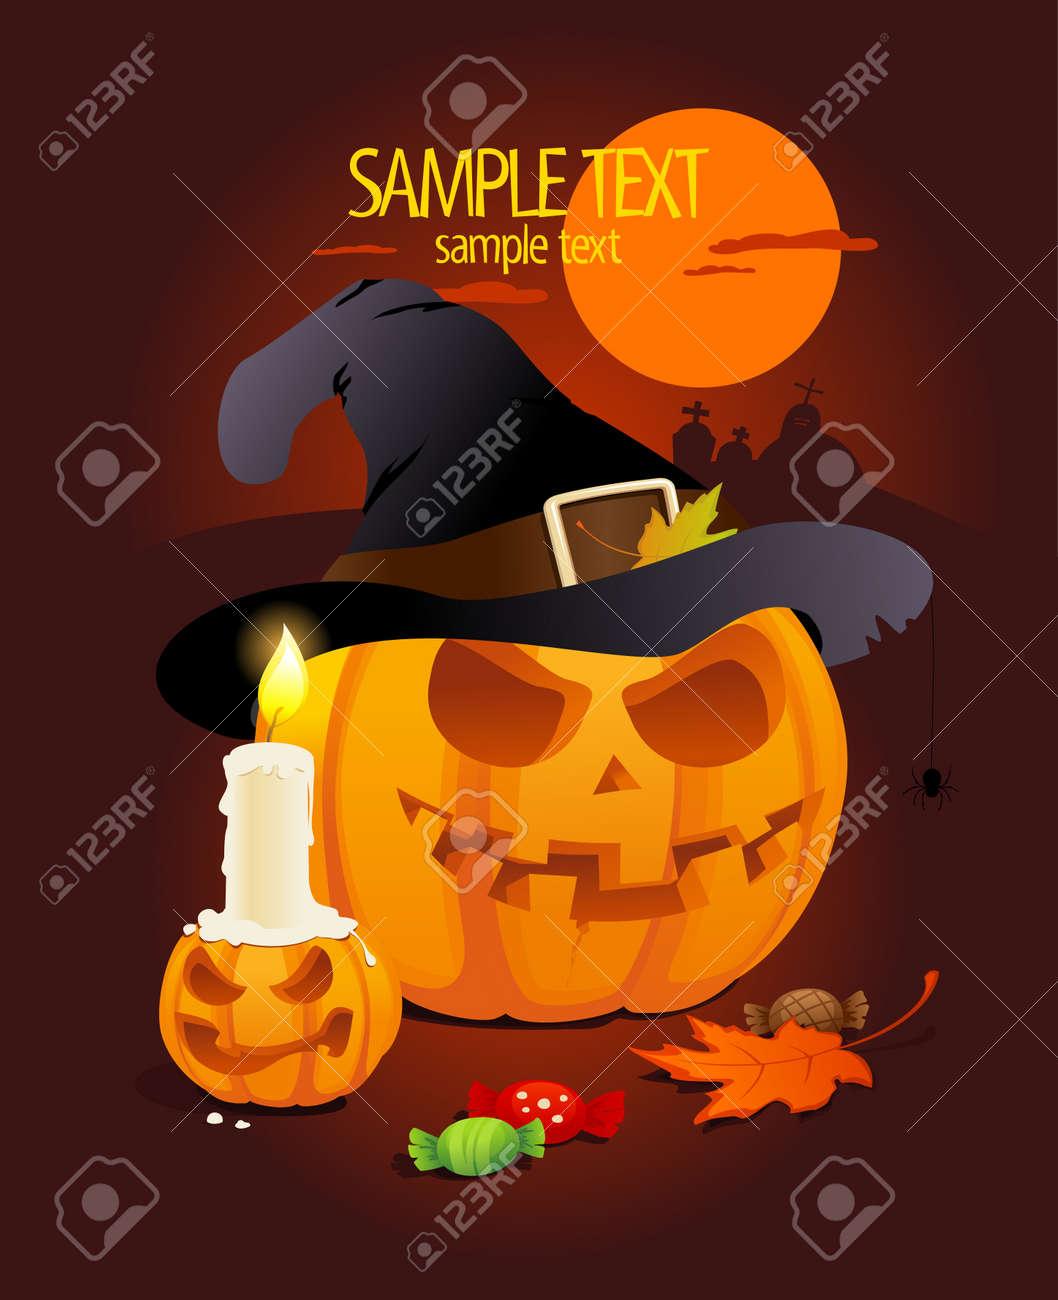 Halloween pumpkins design template Stock Vector - 15413665